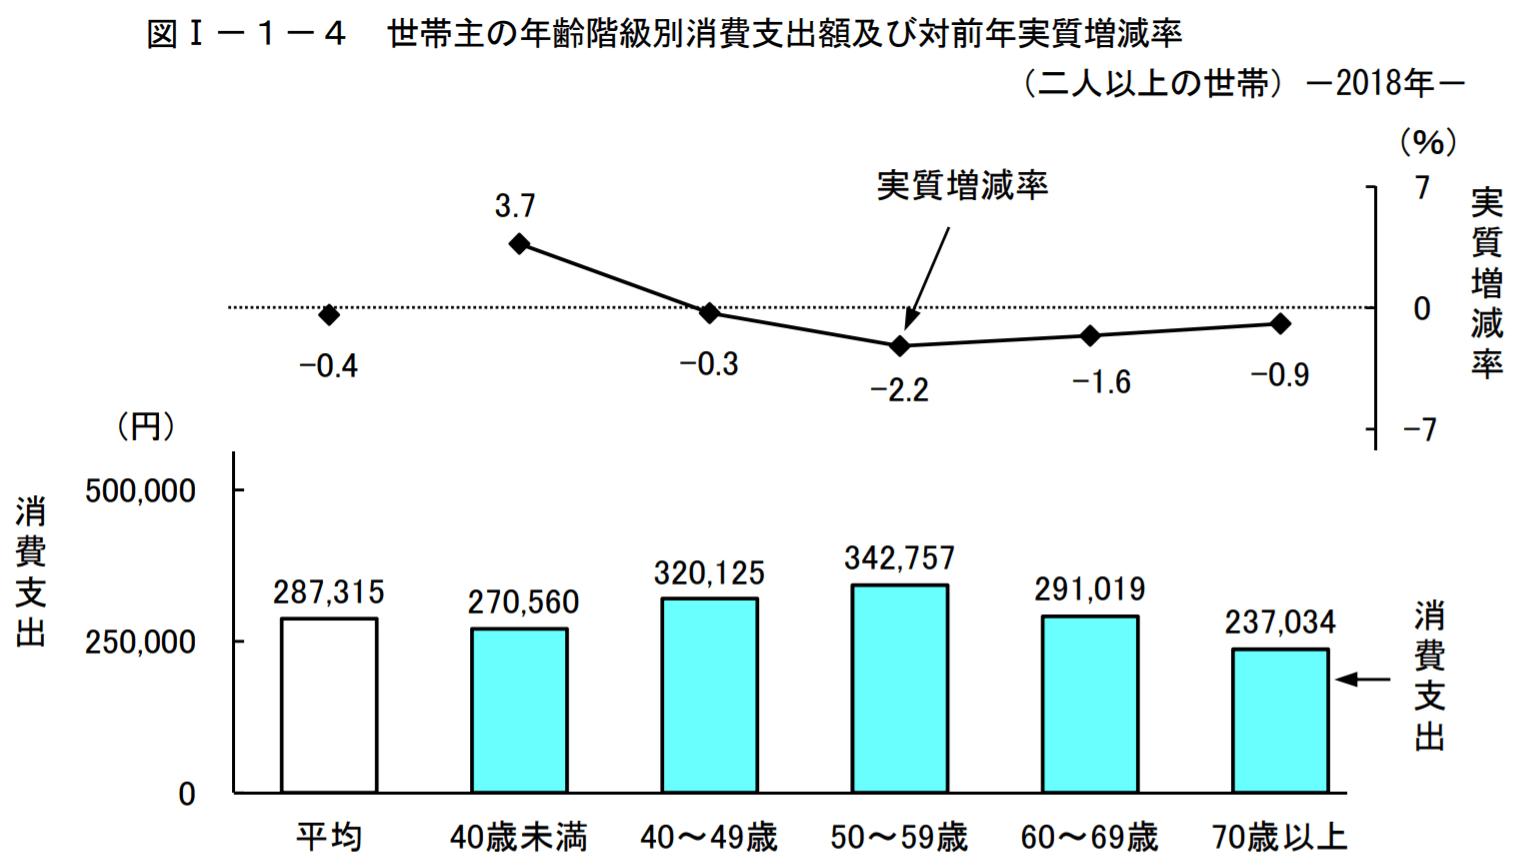 elderly-expense-statistics